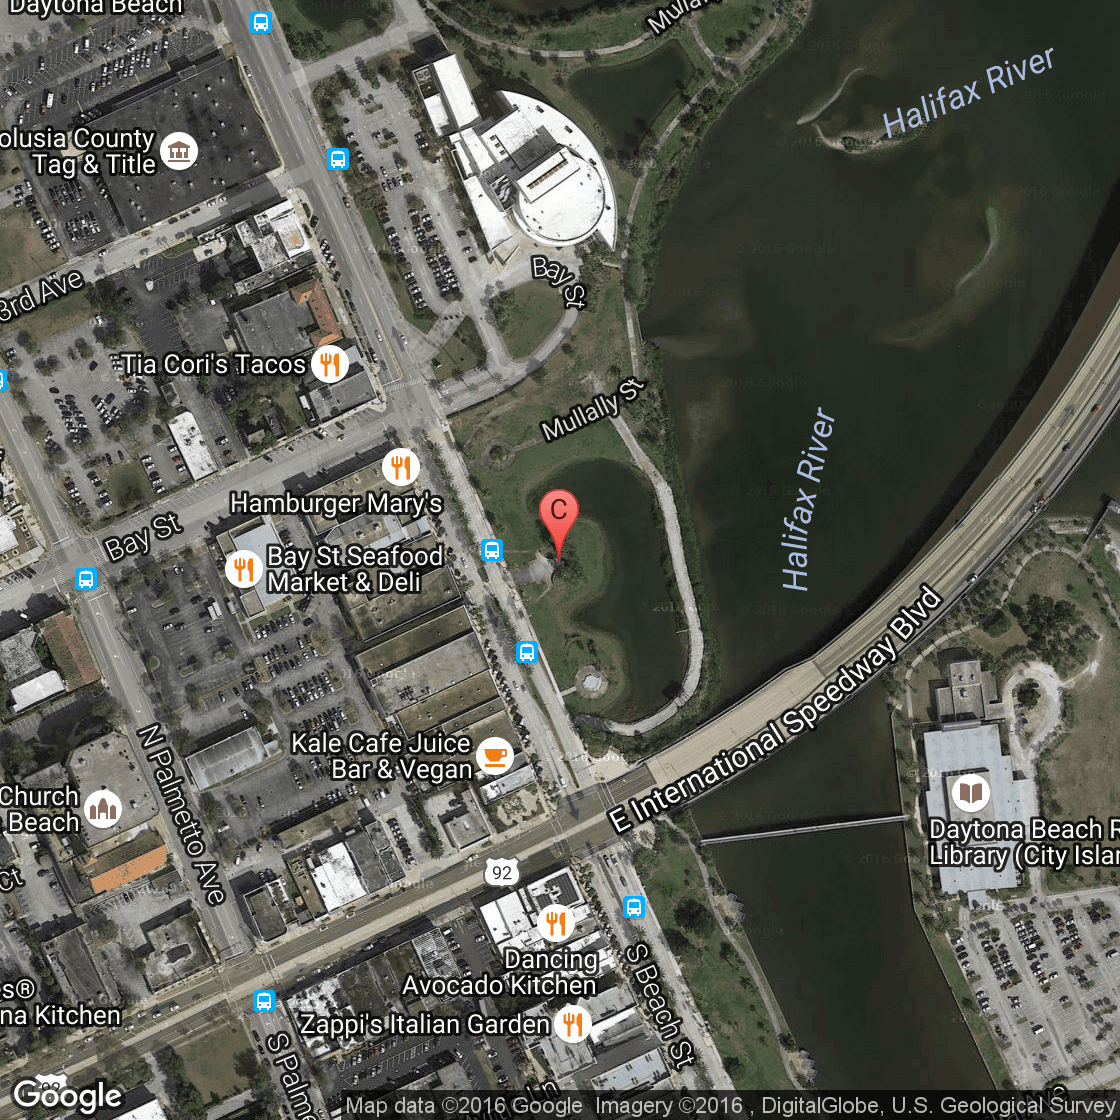 Daytona Beach Hilton Maps